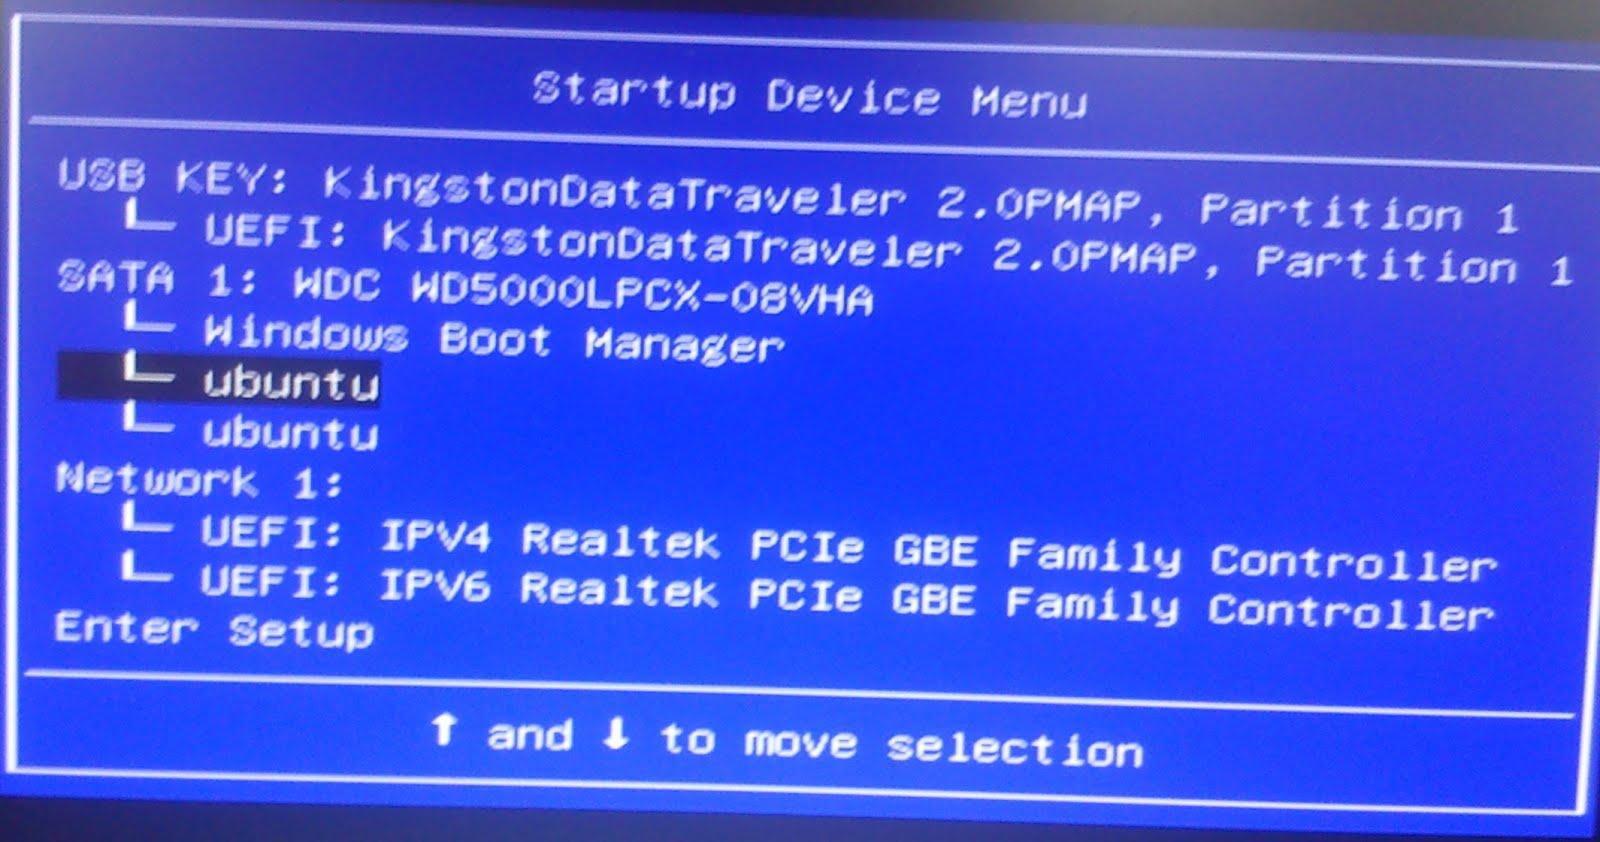 what is uefi ipv4 realtek pcie gbe family controller